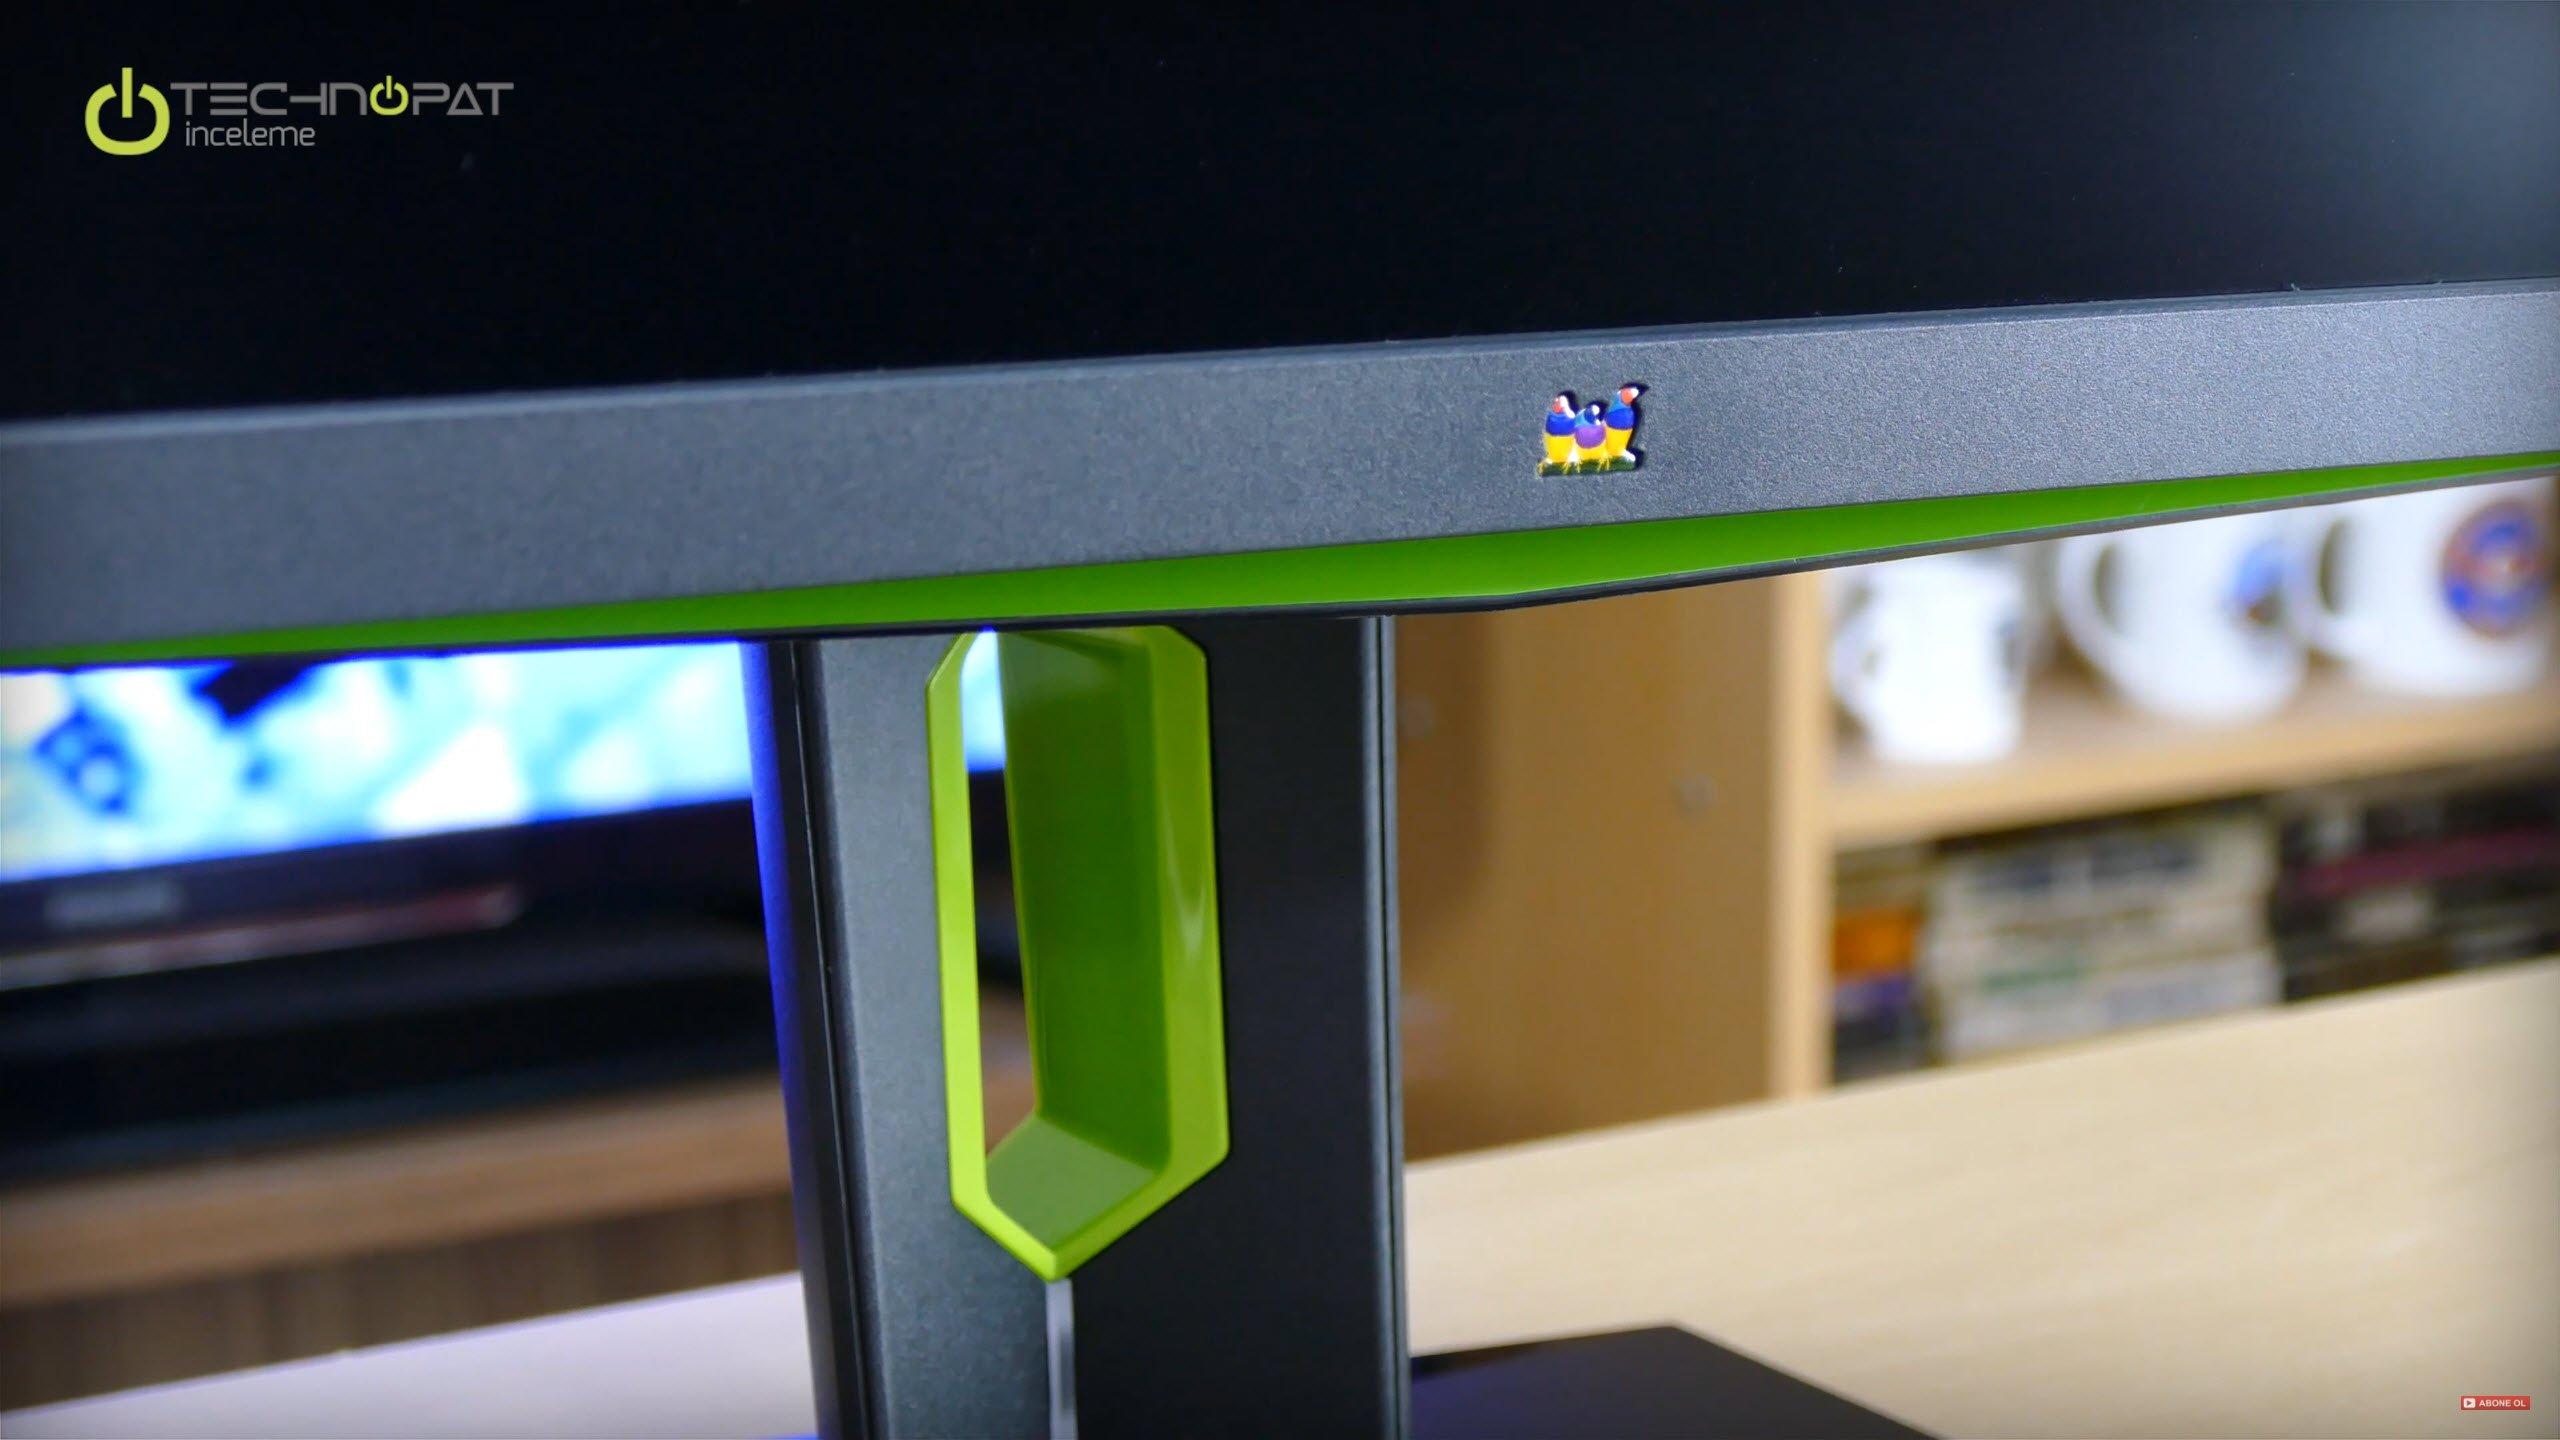 Yeşil Nvidia rengi ile uyumlu, ViewSonic logosu artık daha ufak